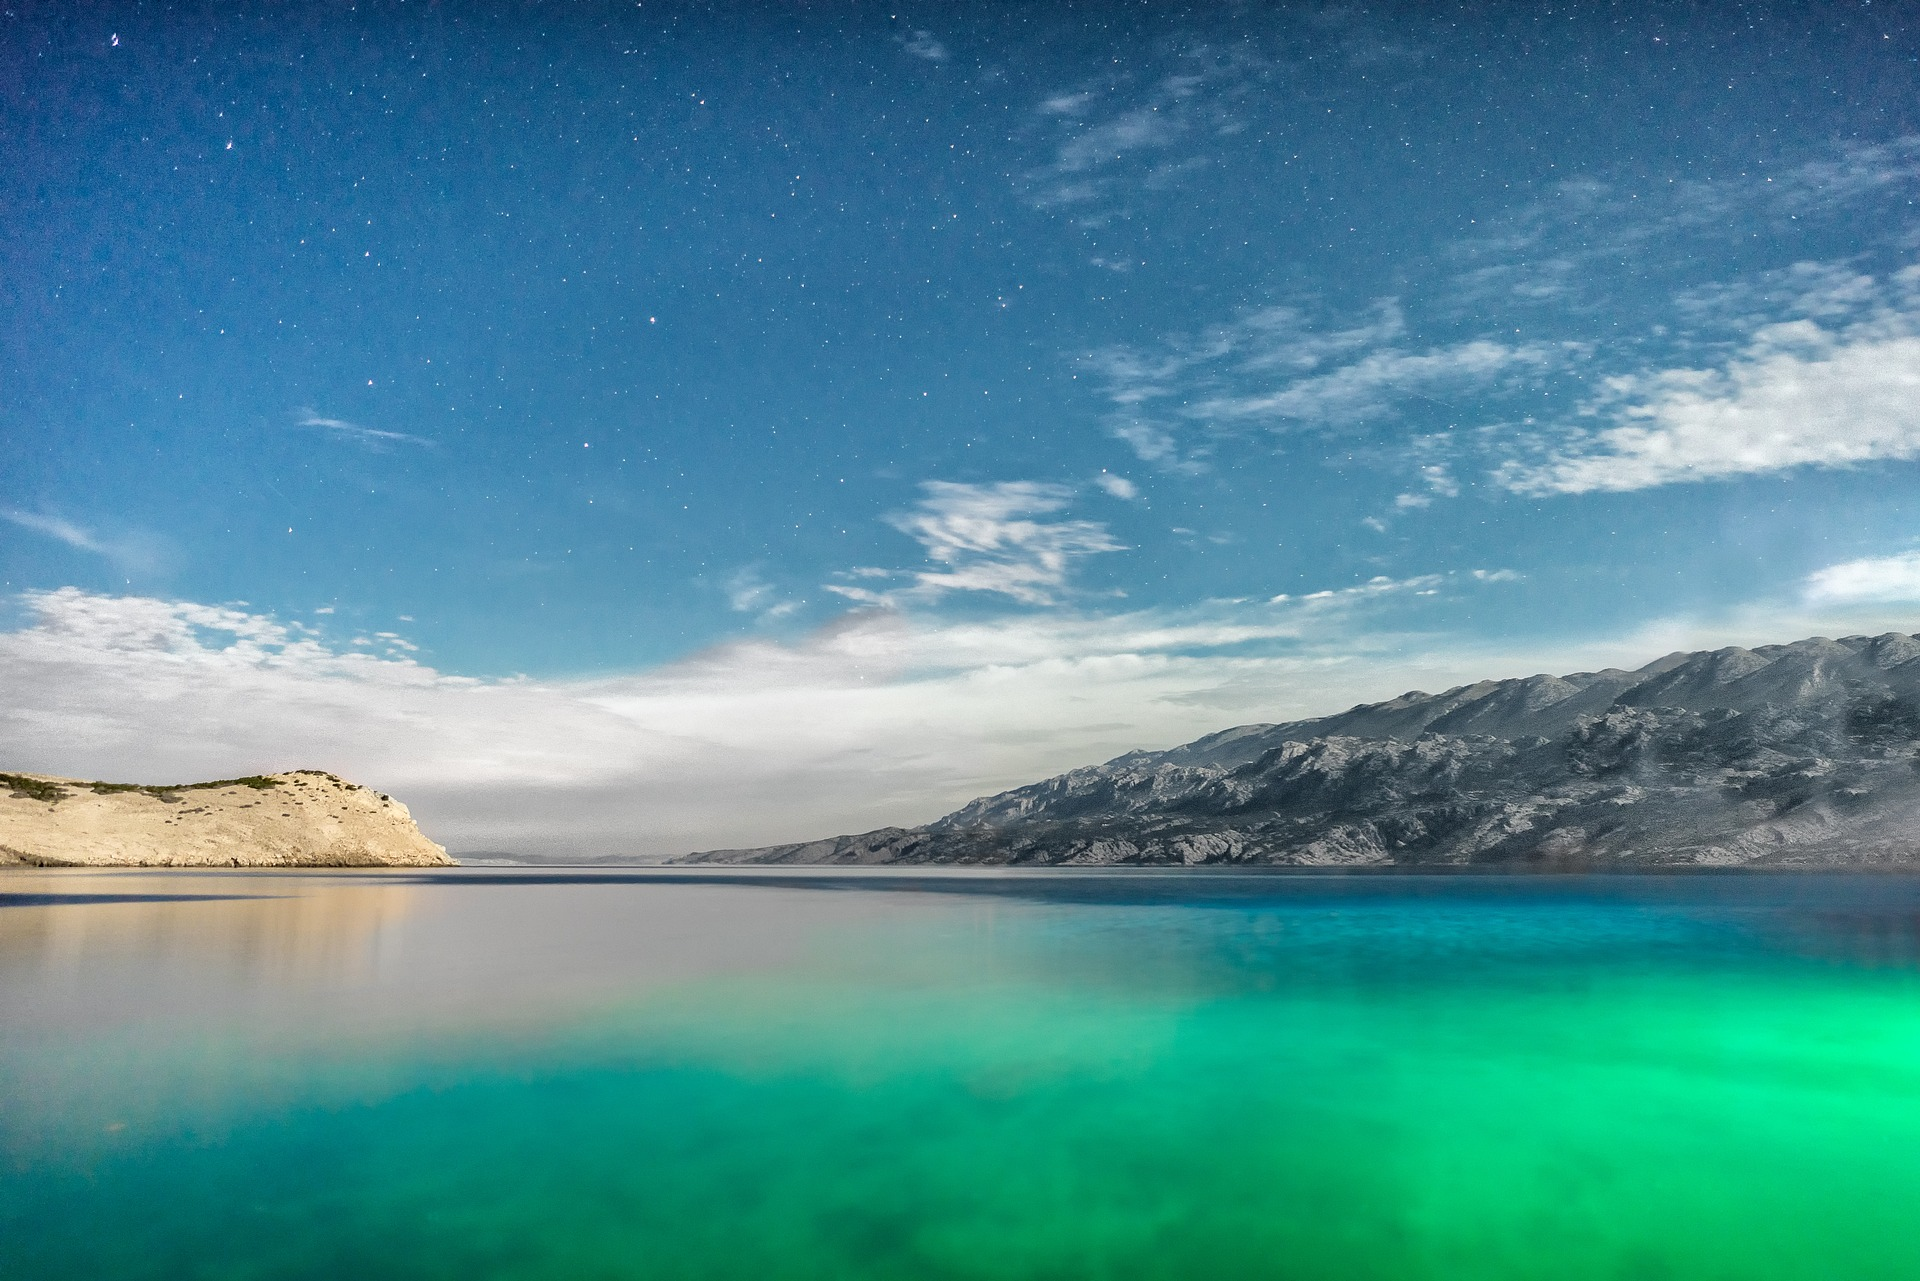 Klima Kroatien & beliebteste Orte Top 5 Finde dein Reisedeal